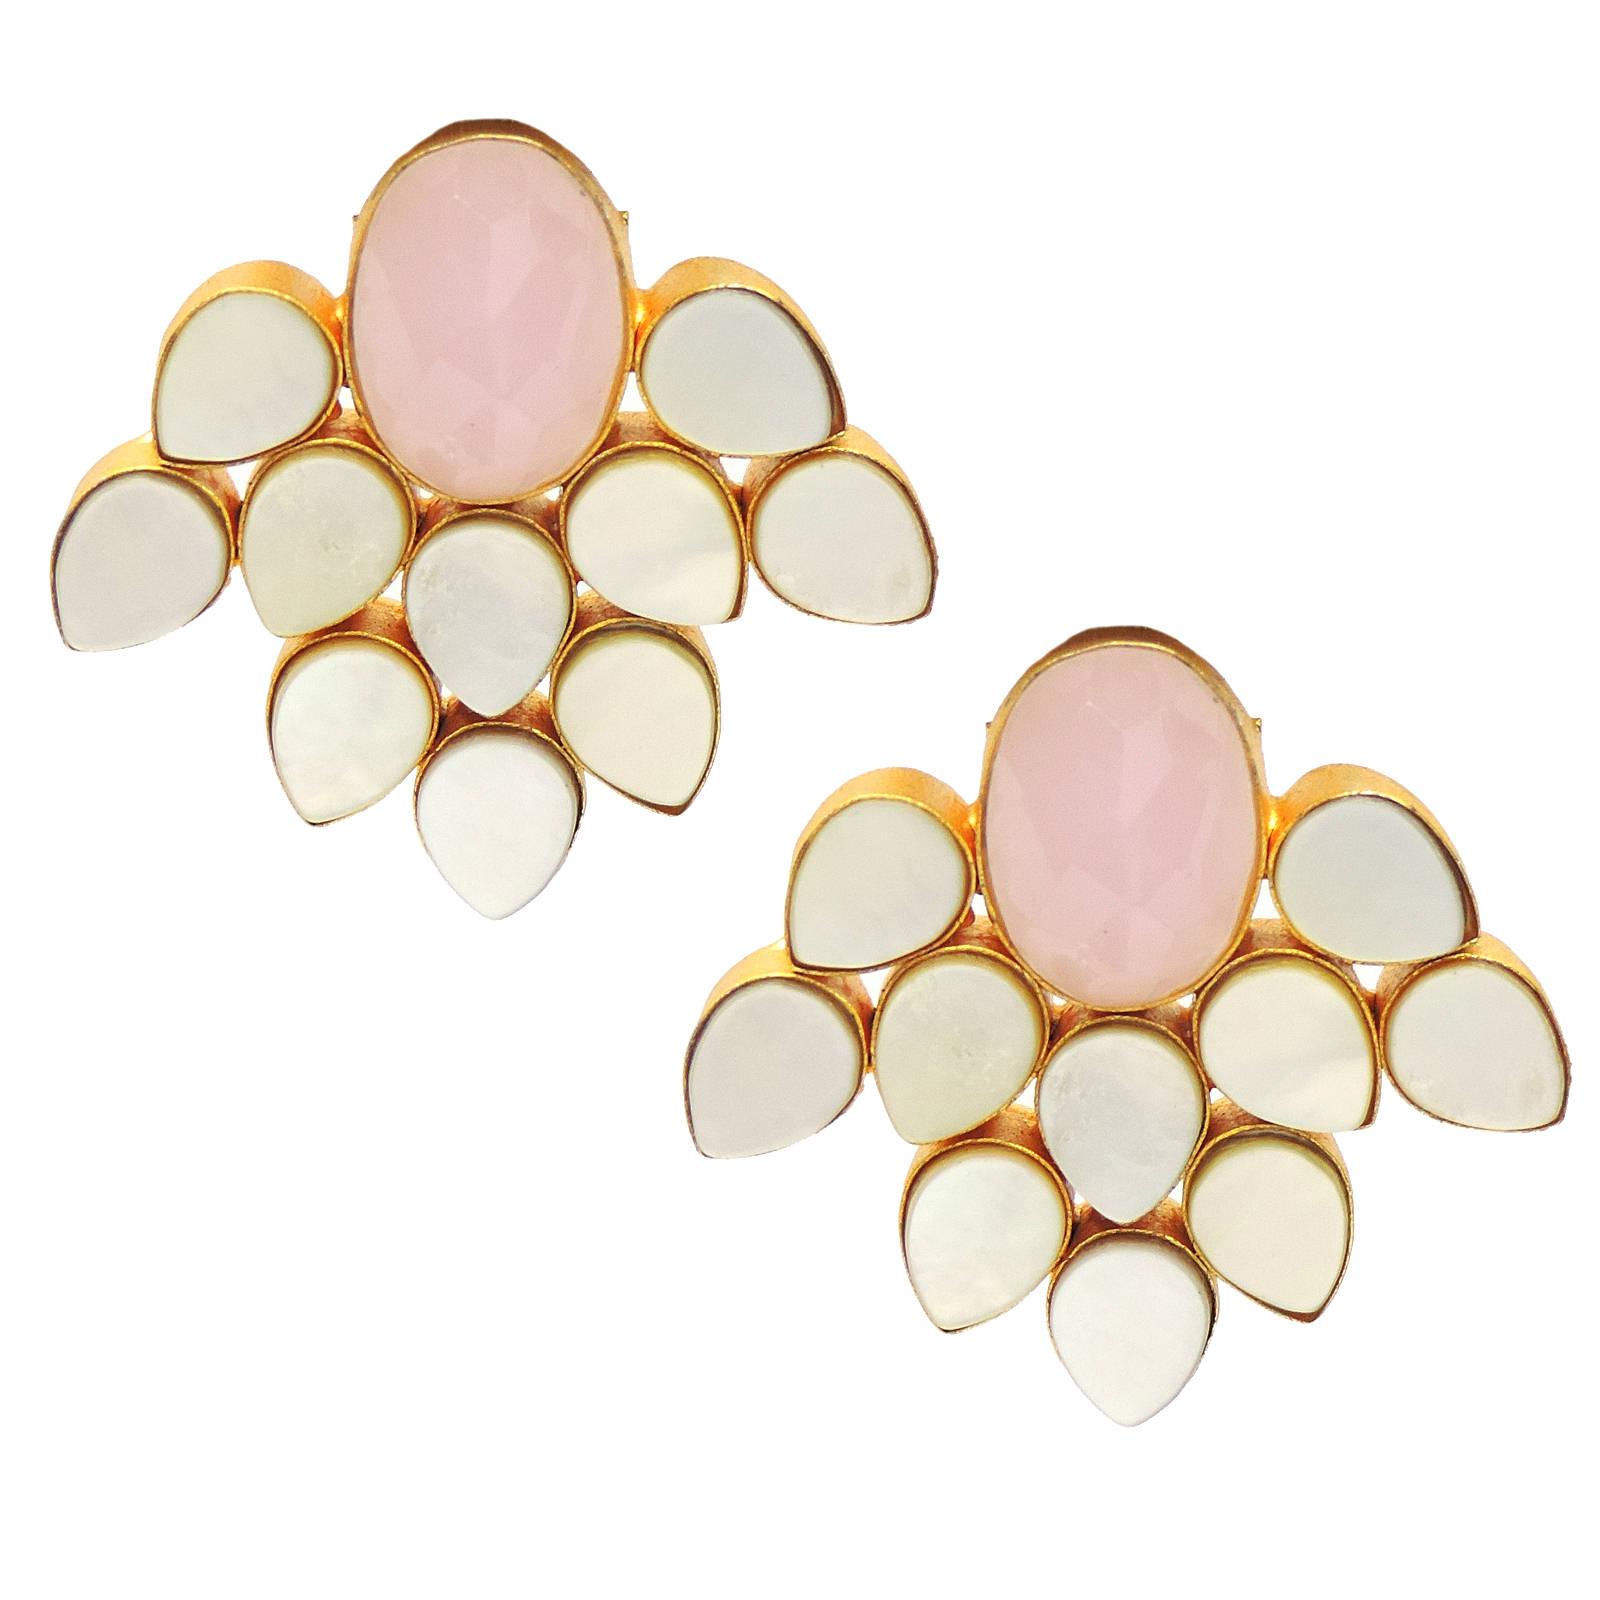 Rose Quartz, Mother of Pearl Earrings